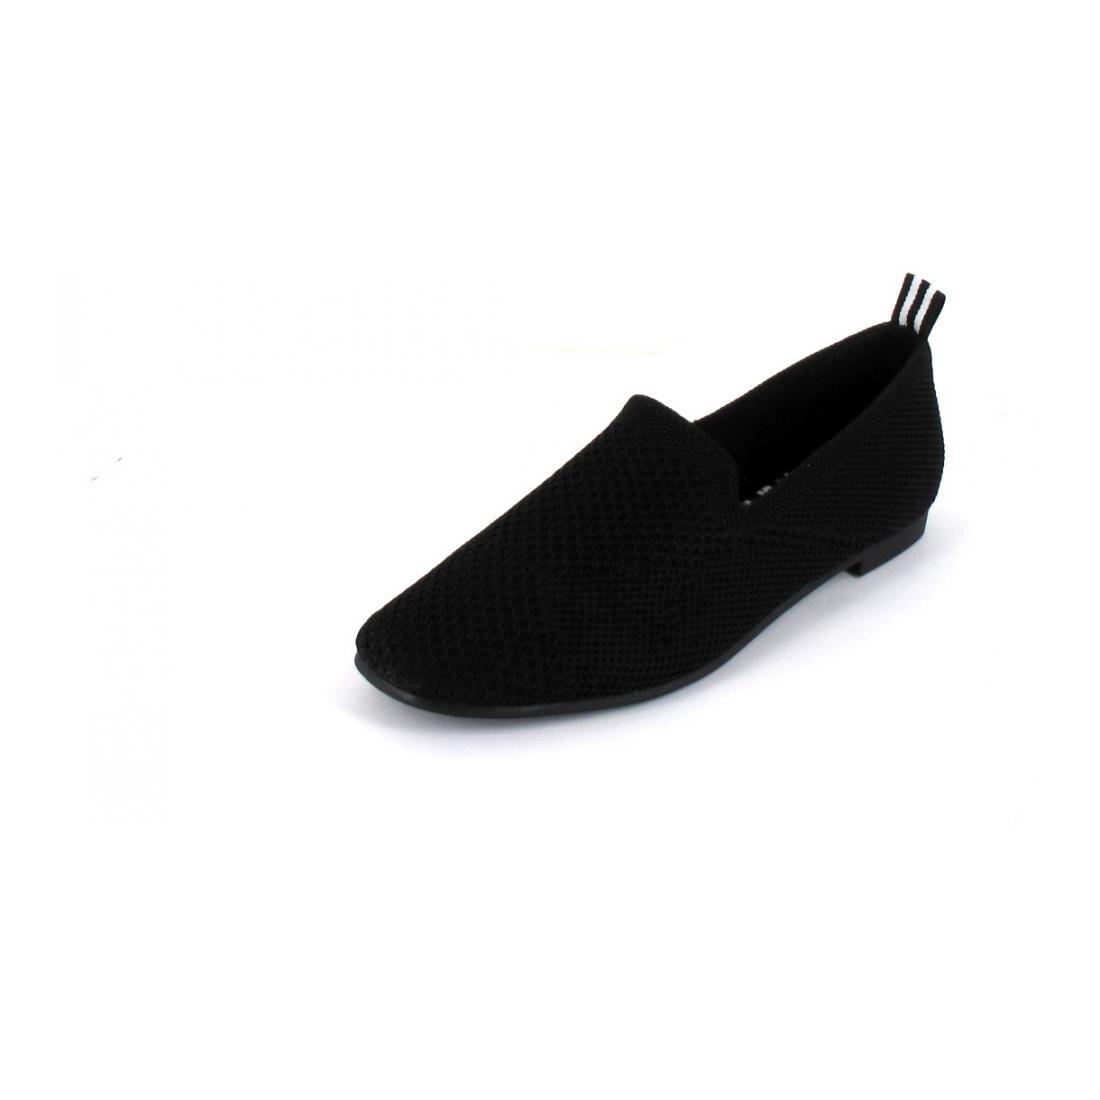 La Strada Slipper Black Knitted